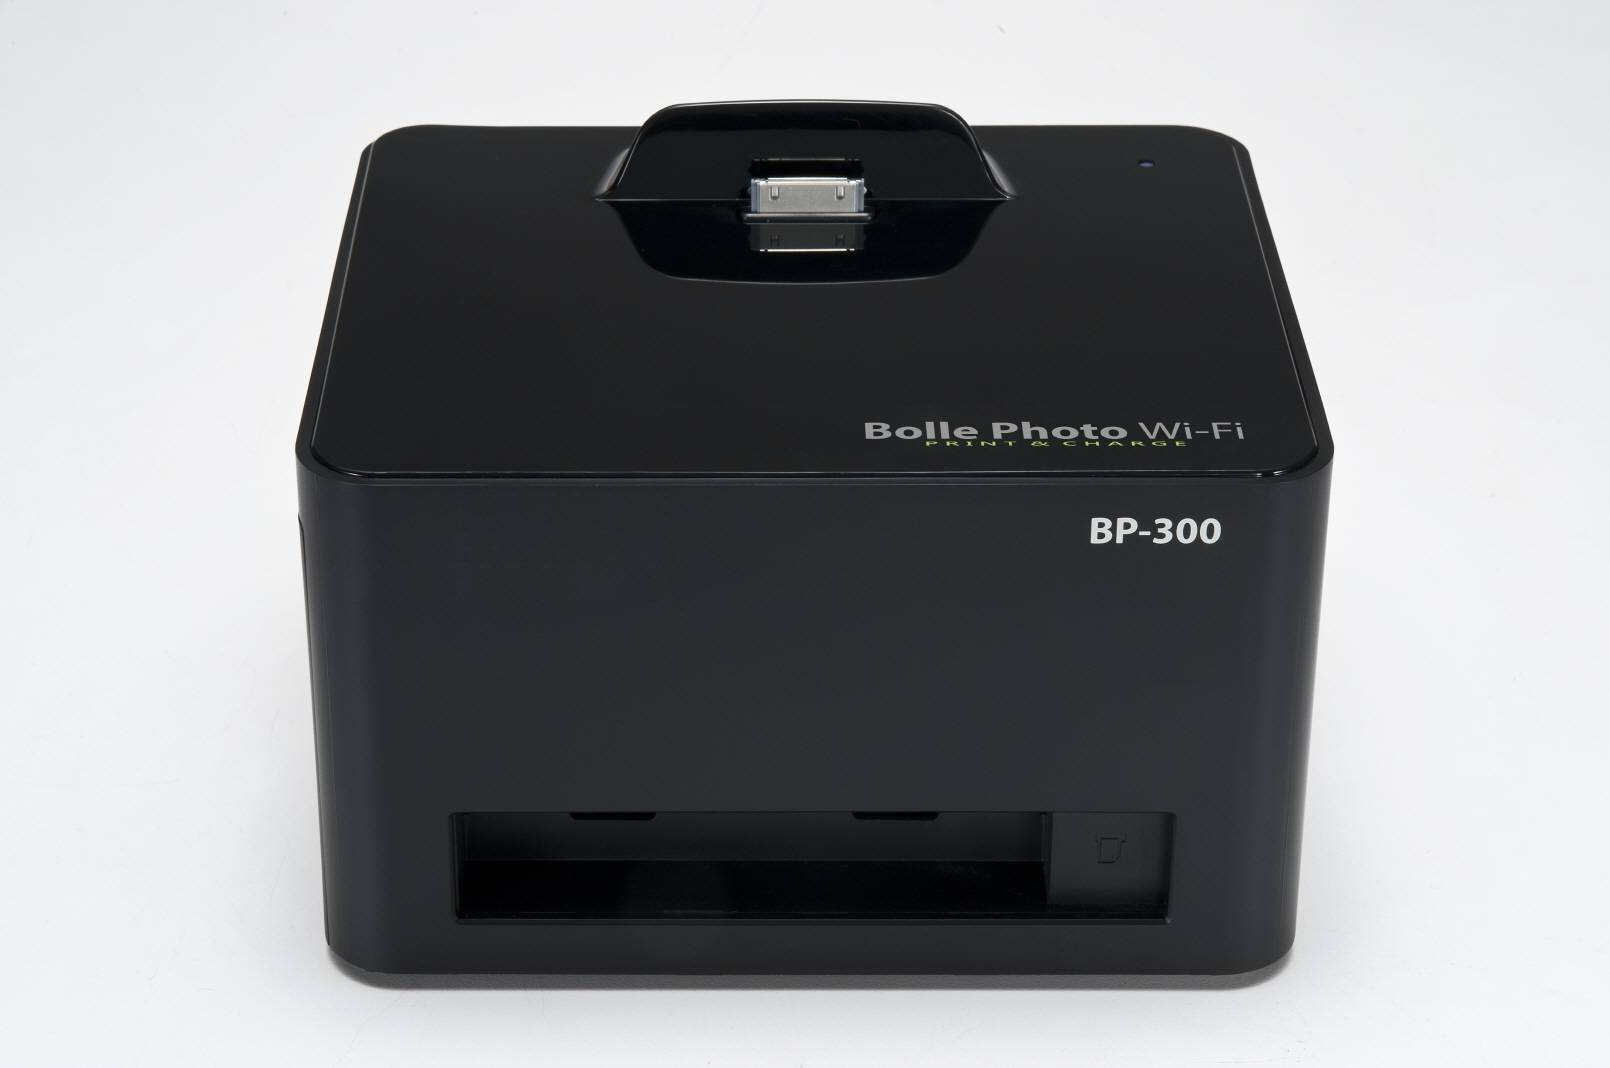 Bolle Photo Wi-Fi